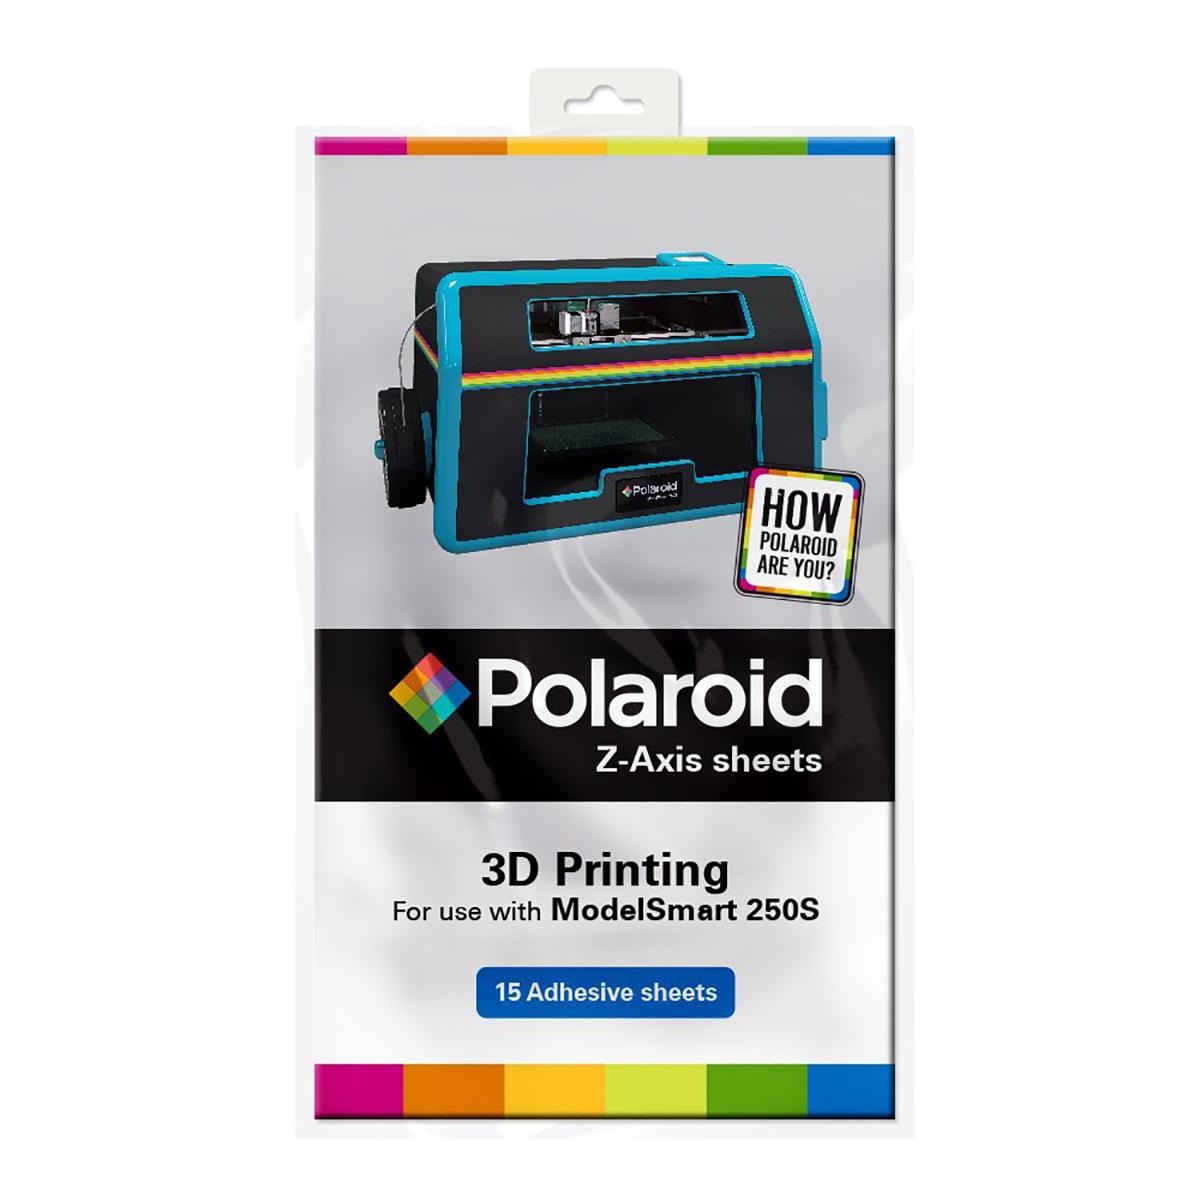 Polaroid ModelSmart 250S Z-Axis sheets 15 Sheets